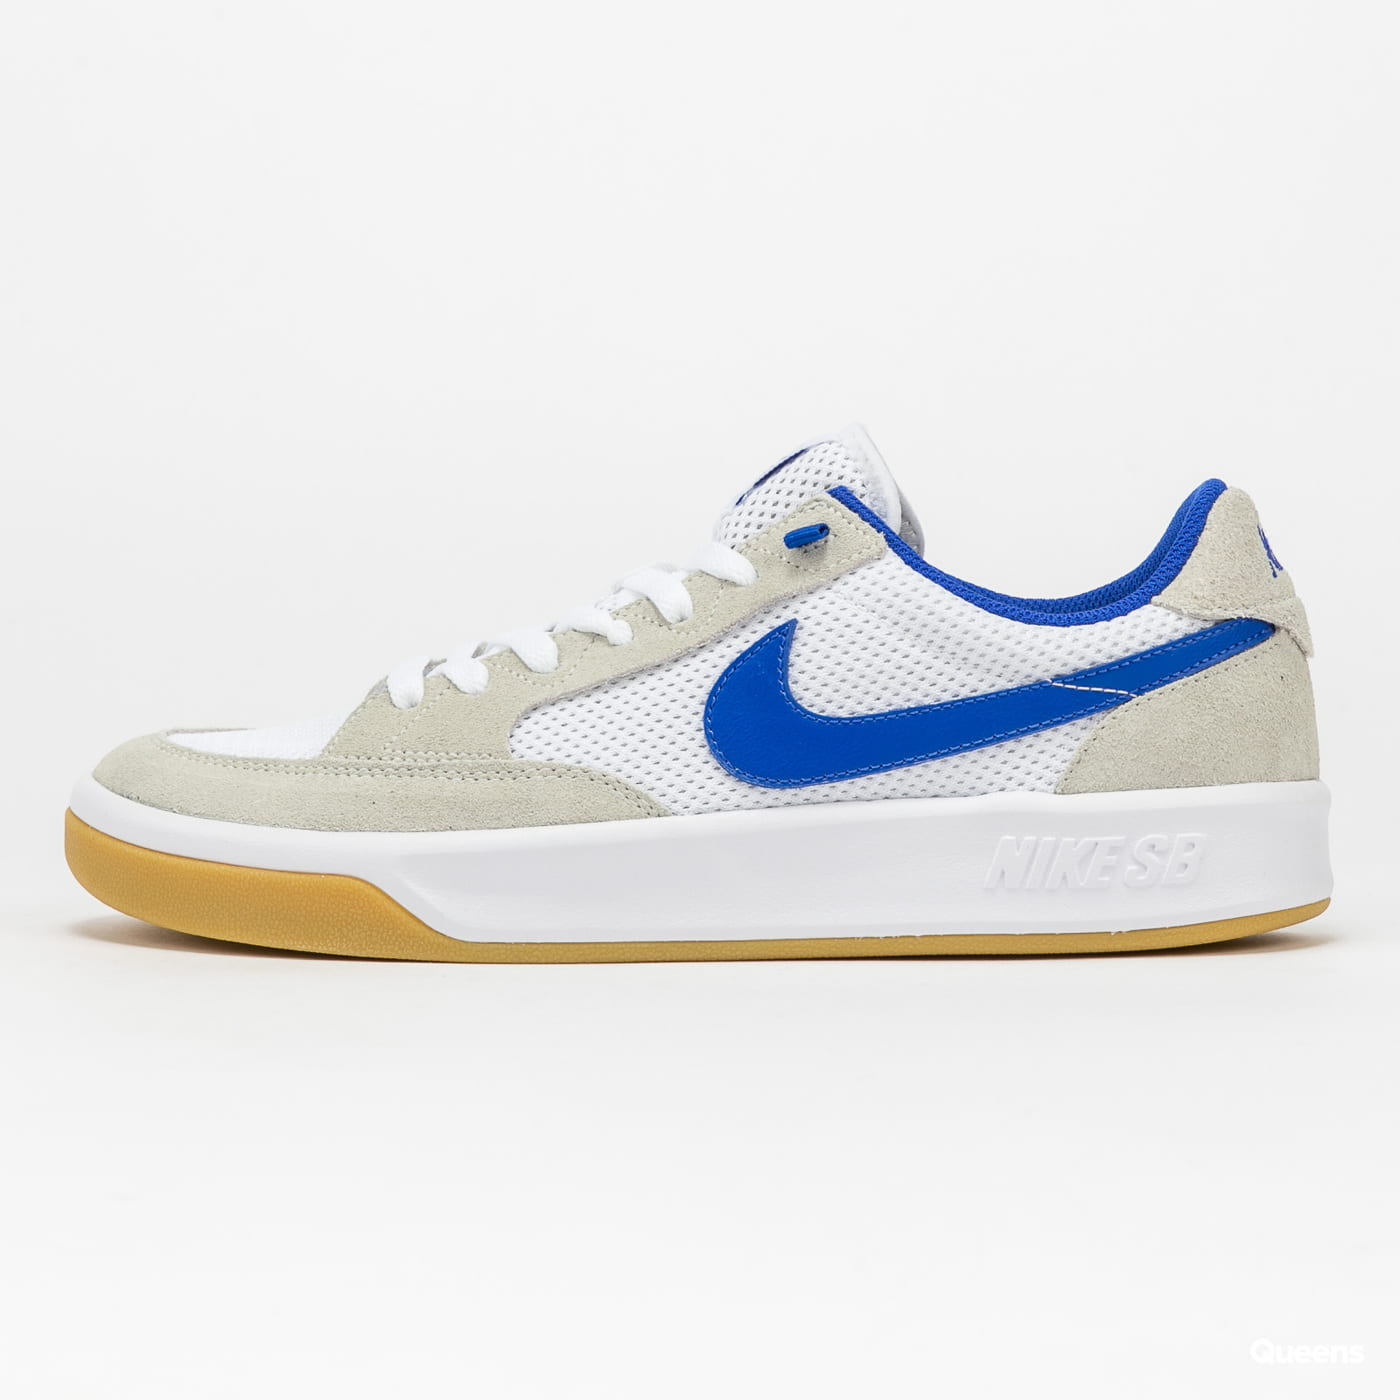 Nike SB Adversary summit white / hyper royal / white